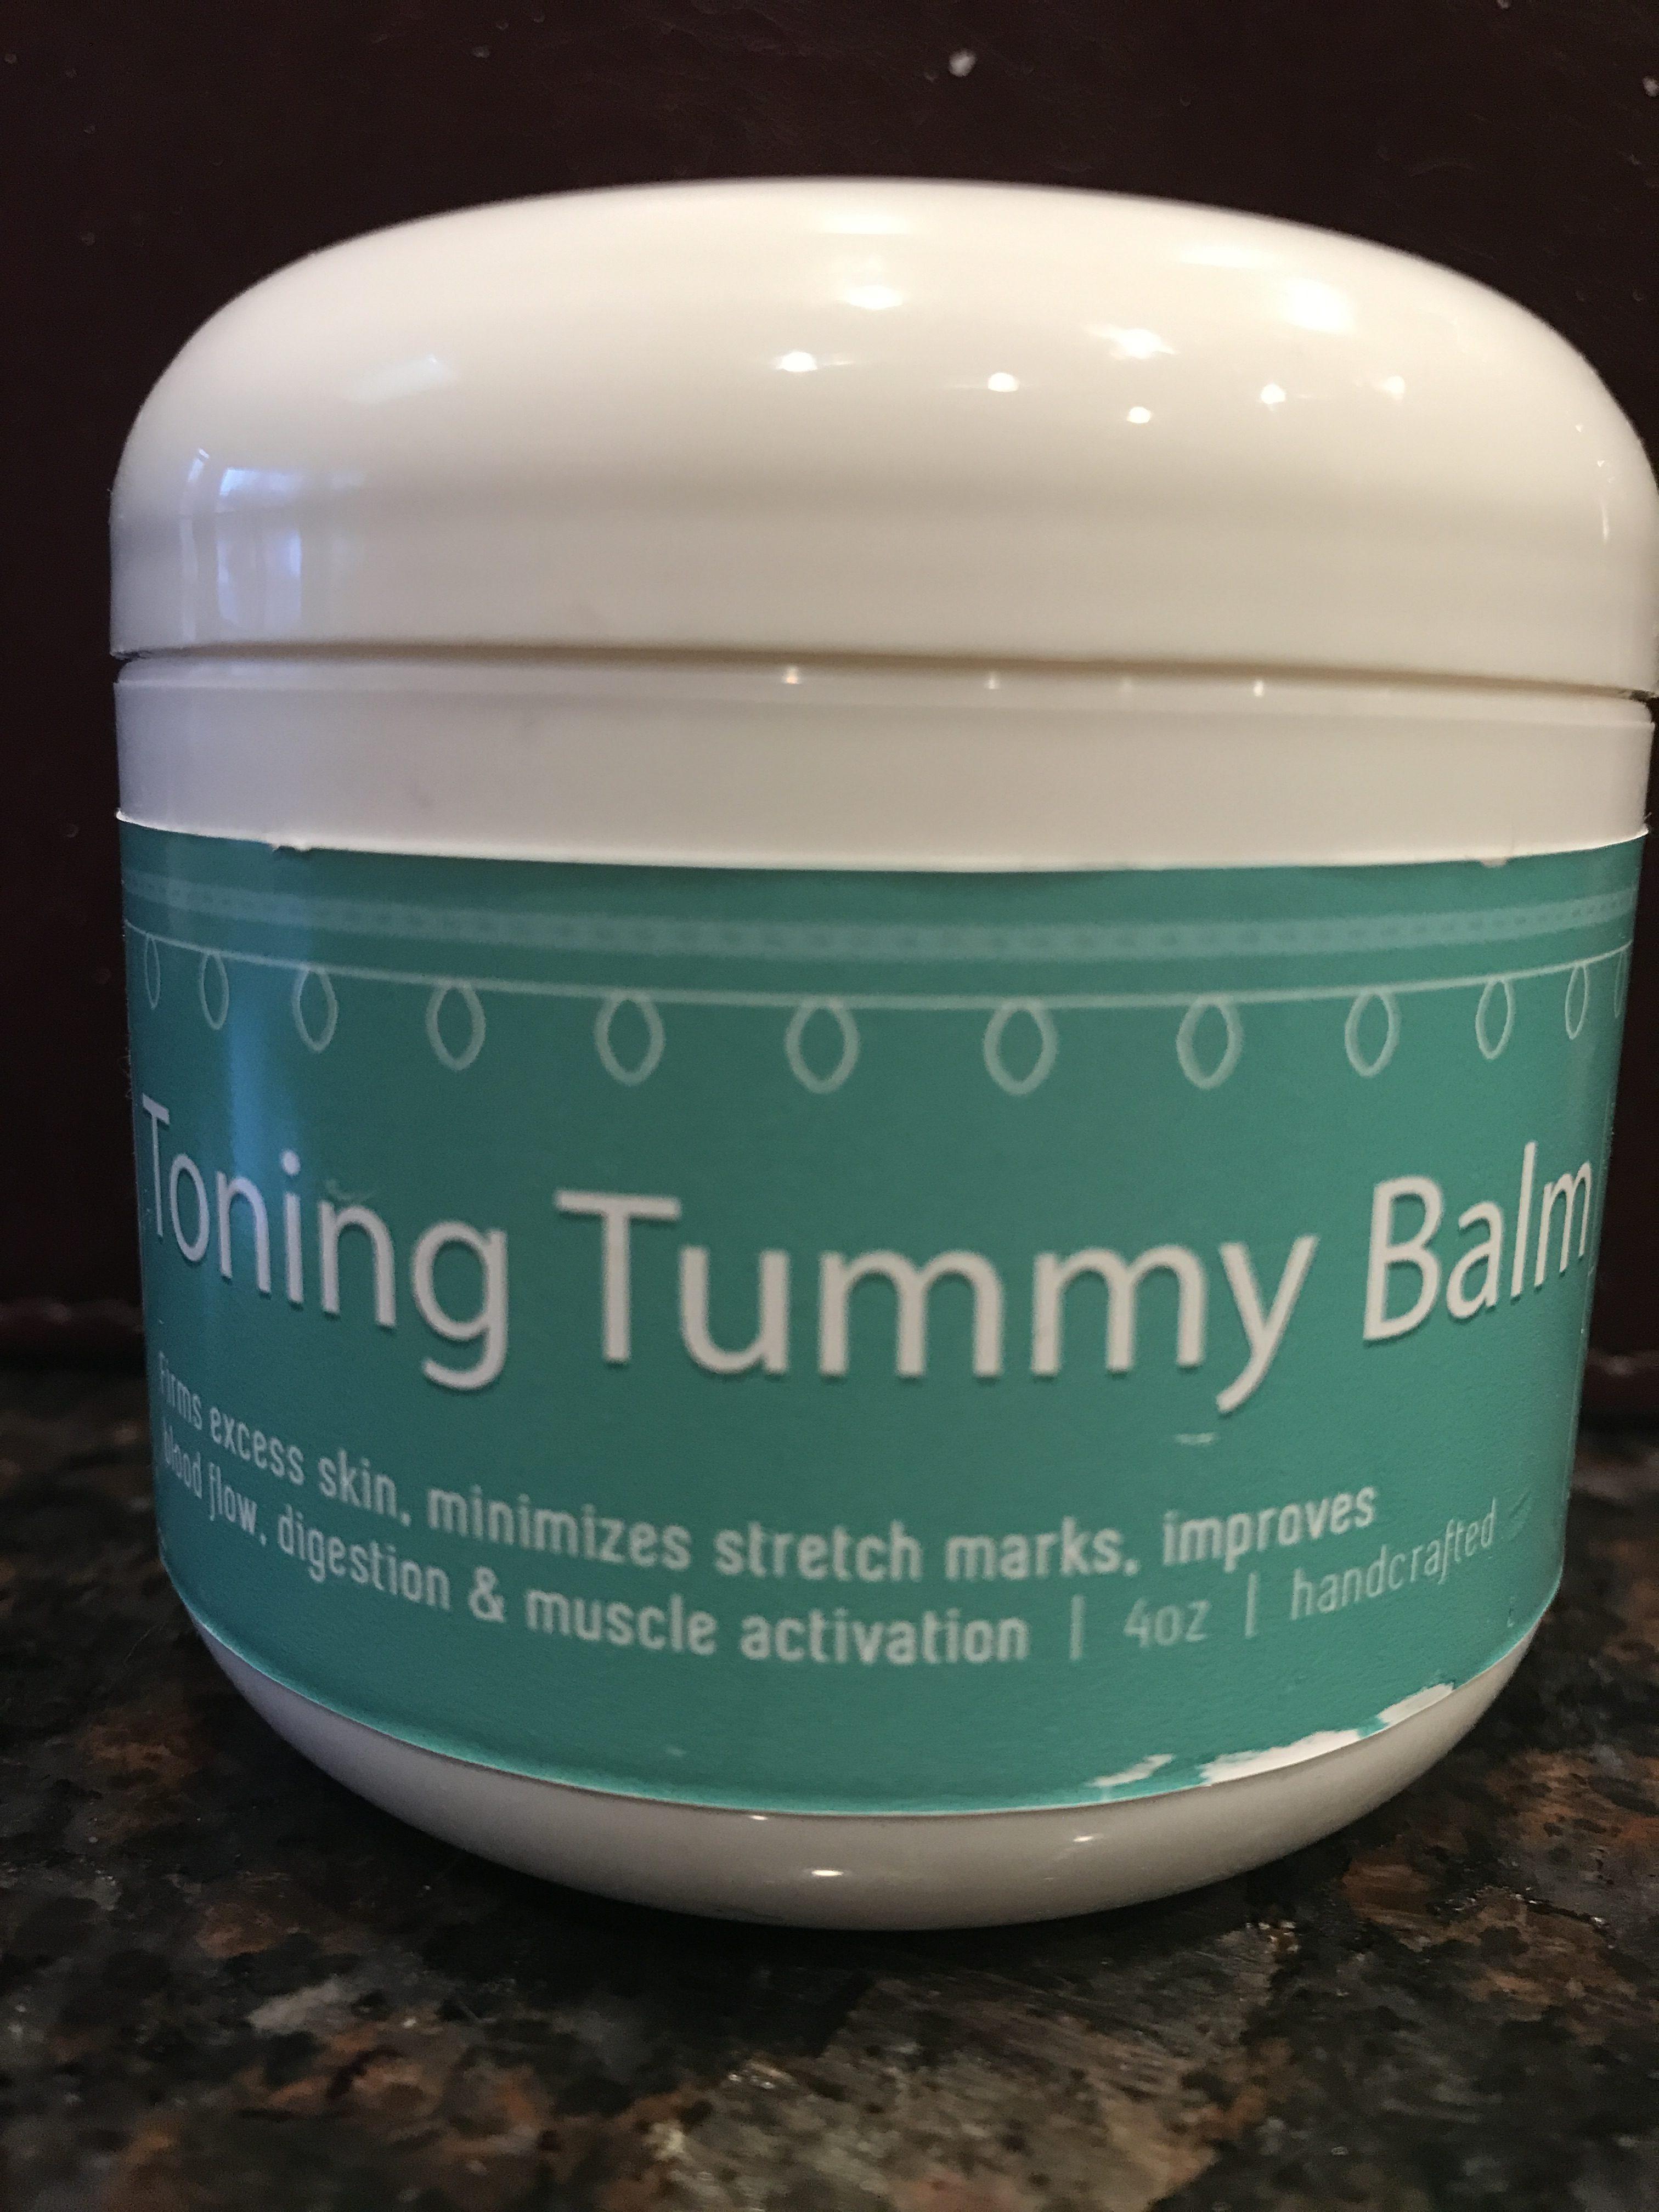 Toning Tummy Balm